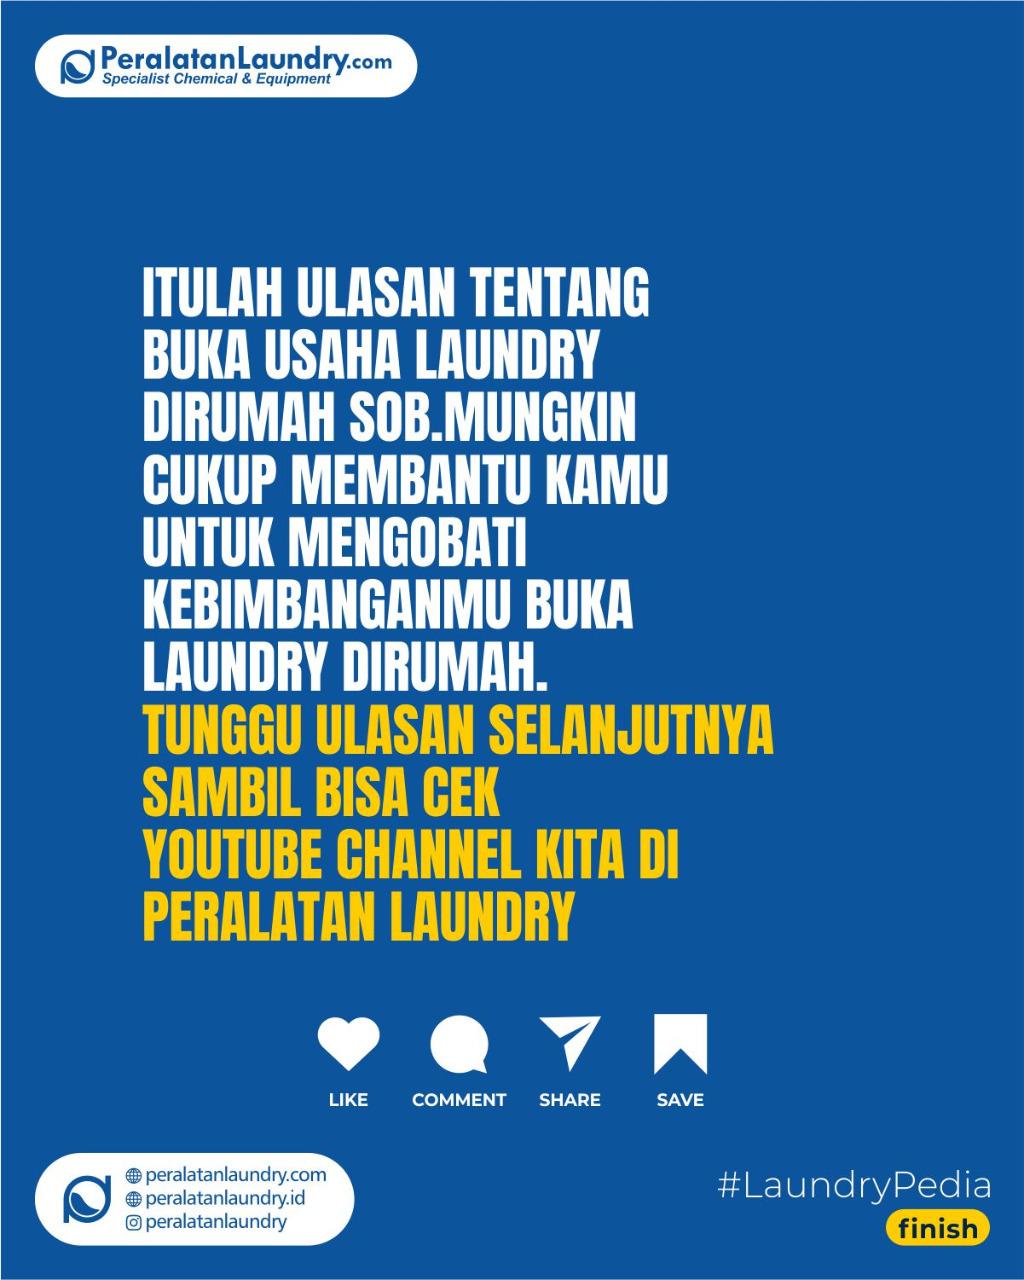 buka usaha laundry di rumah